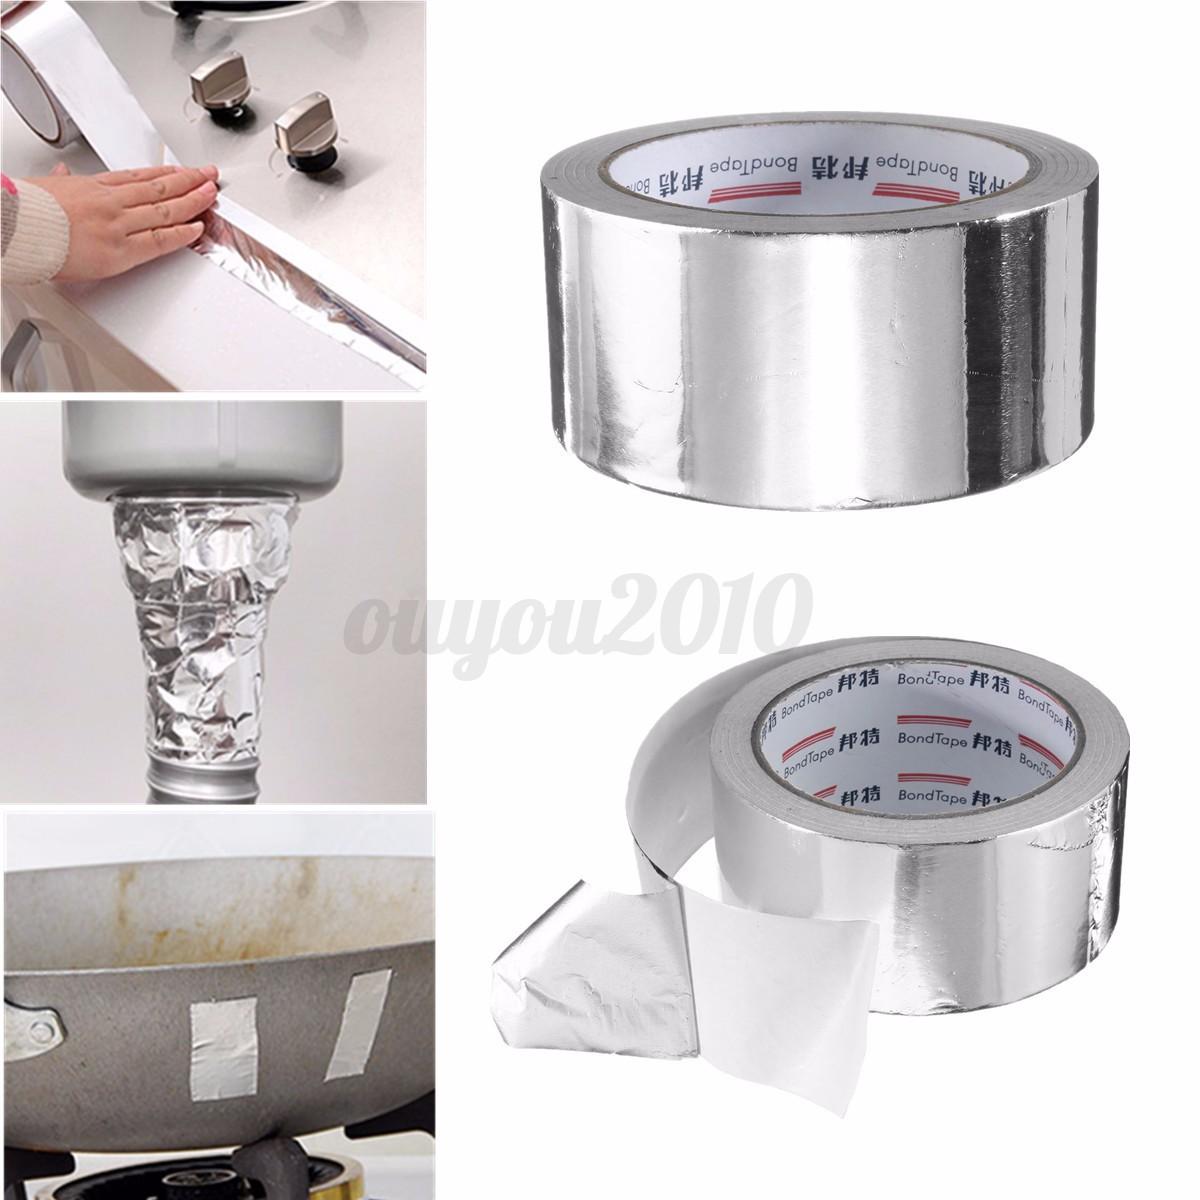 50mm x 25m aluminium bande ruban adh sif autocollante for Isolant fenetre adhesif